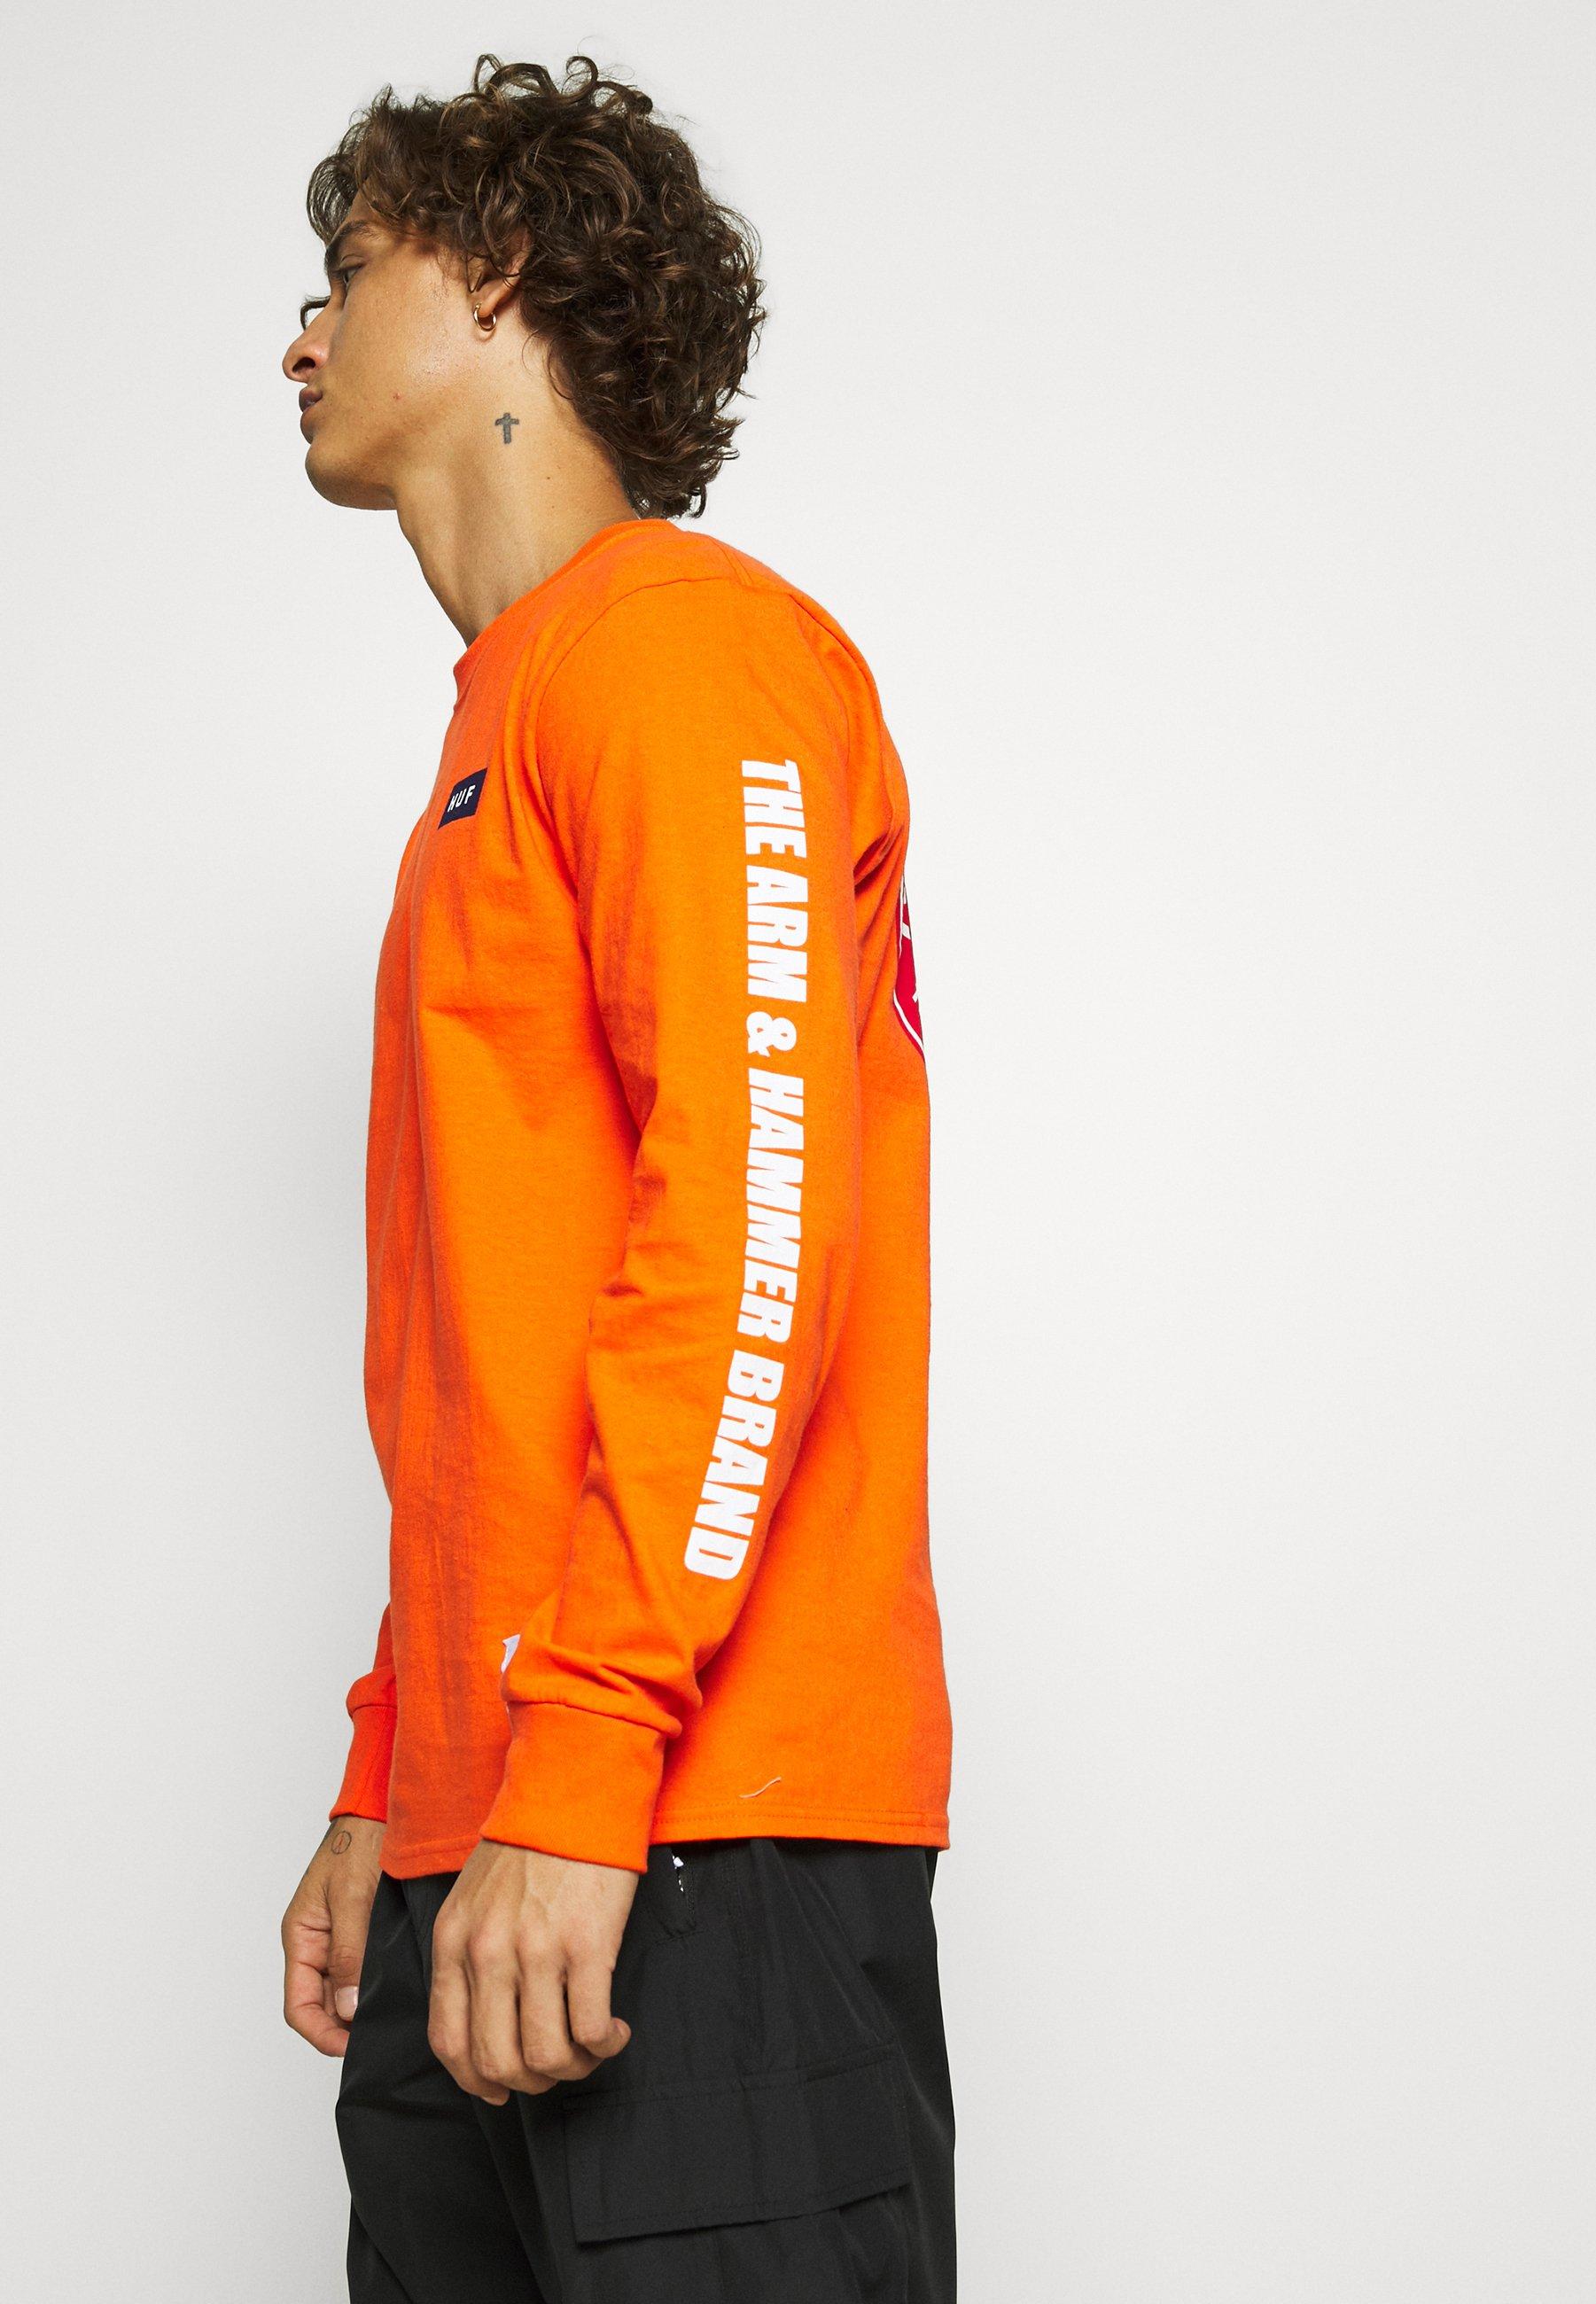 Huf Arm Hammer Seal Tee - T-shirt À Manches Longues Orange